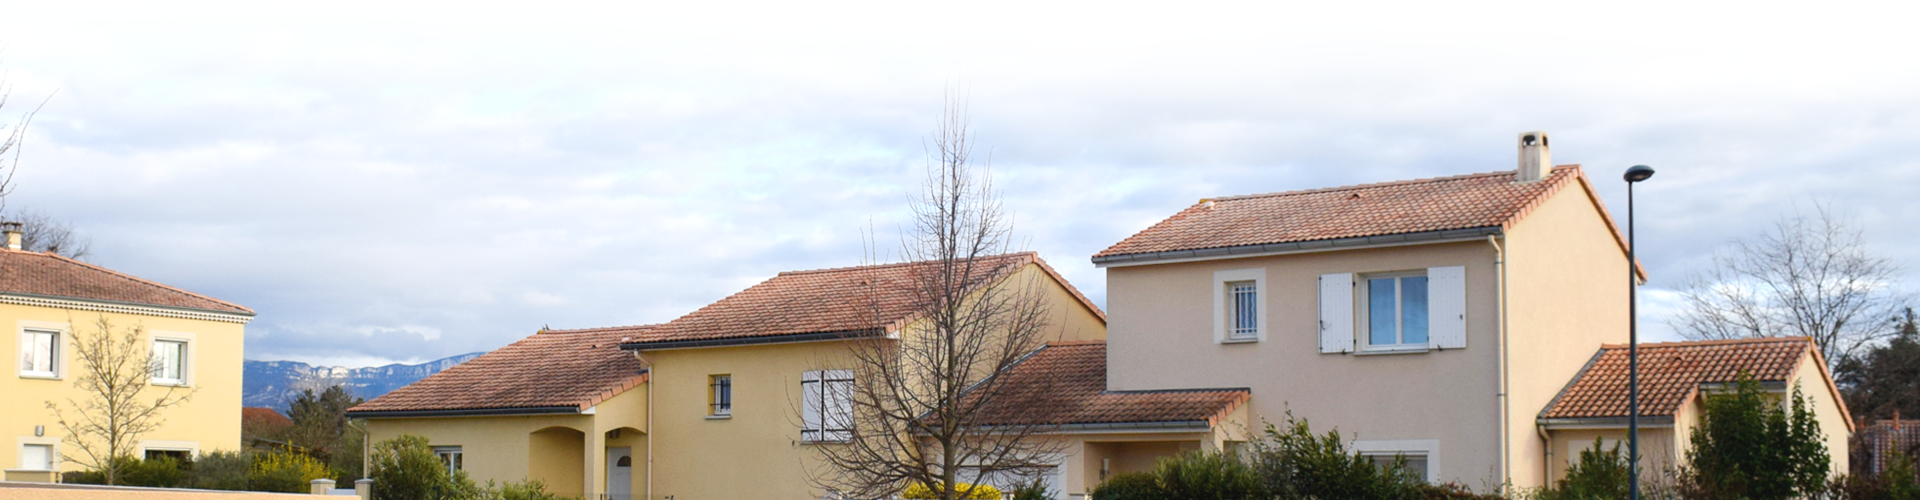 maisons-renovation-drome